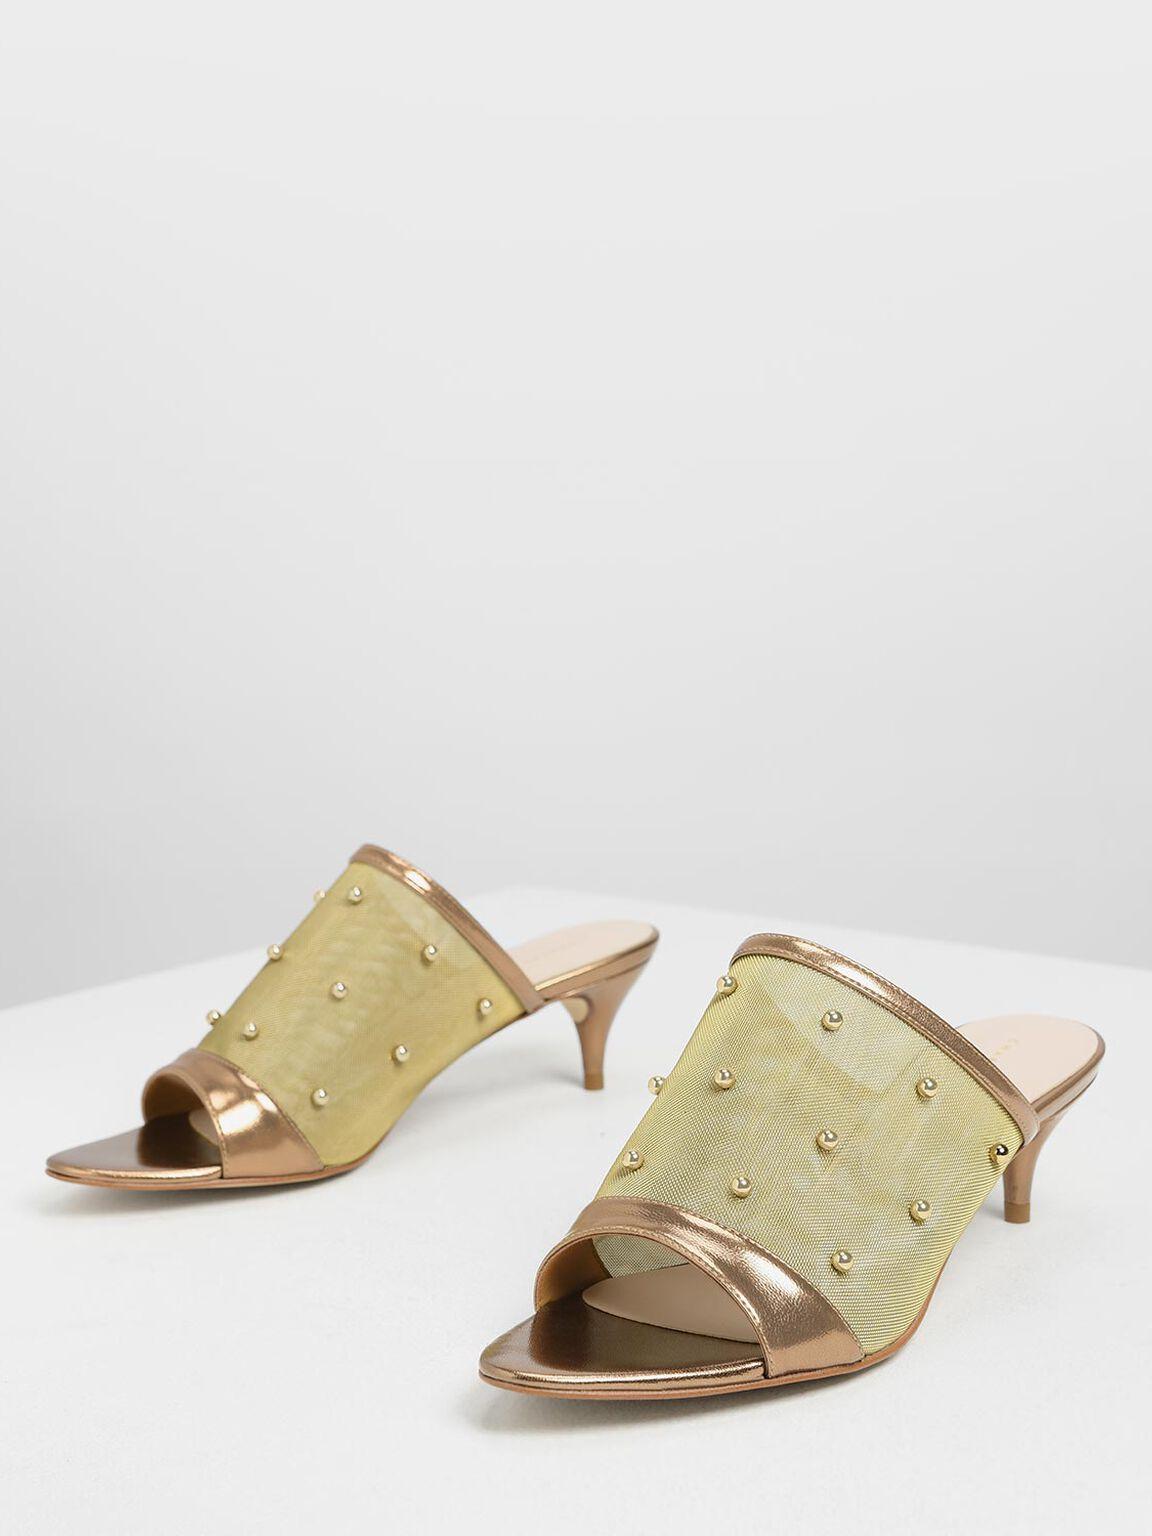 Embellished Mesh Kitten Heel Slide Sandals, Bronze, hi-res